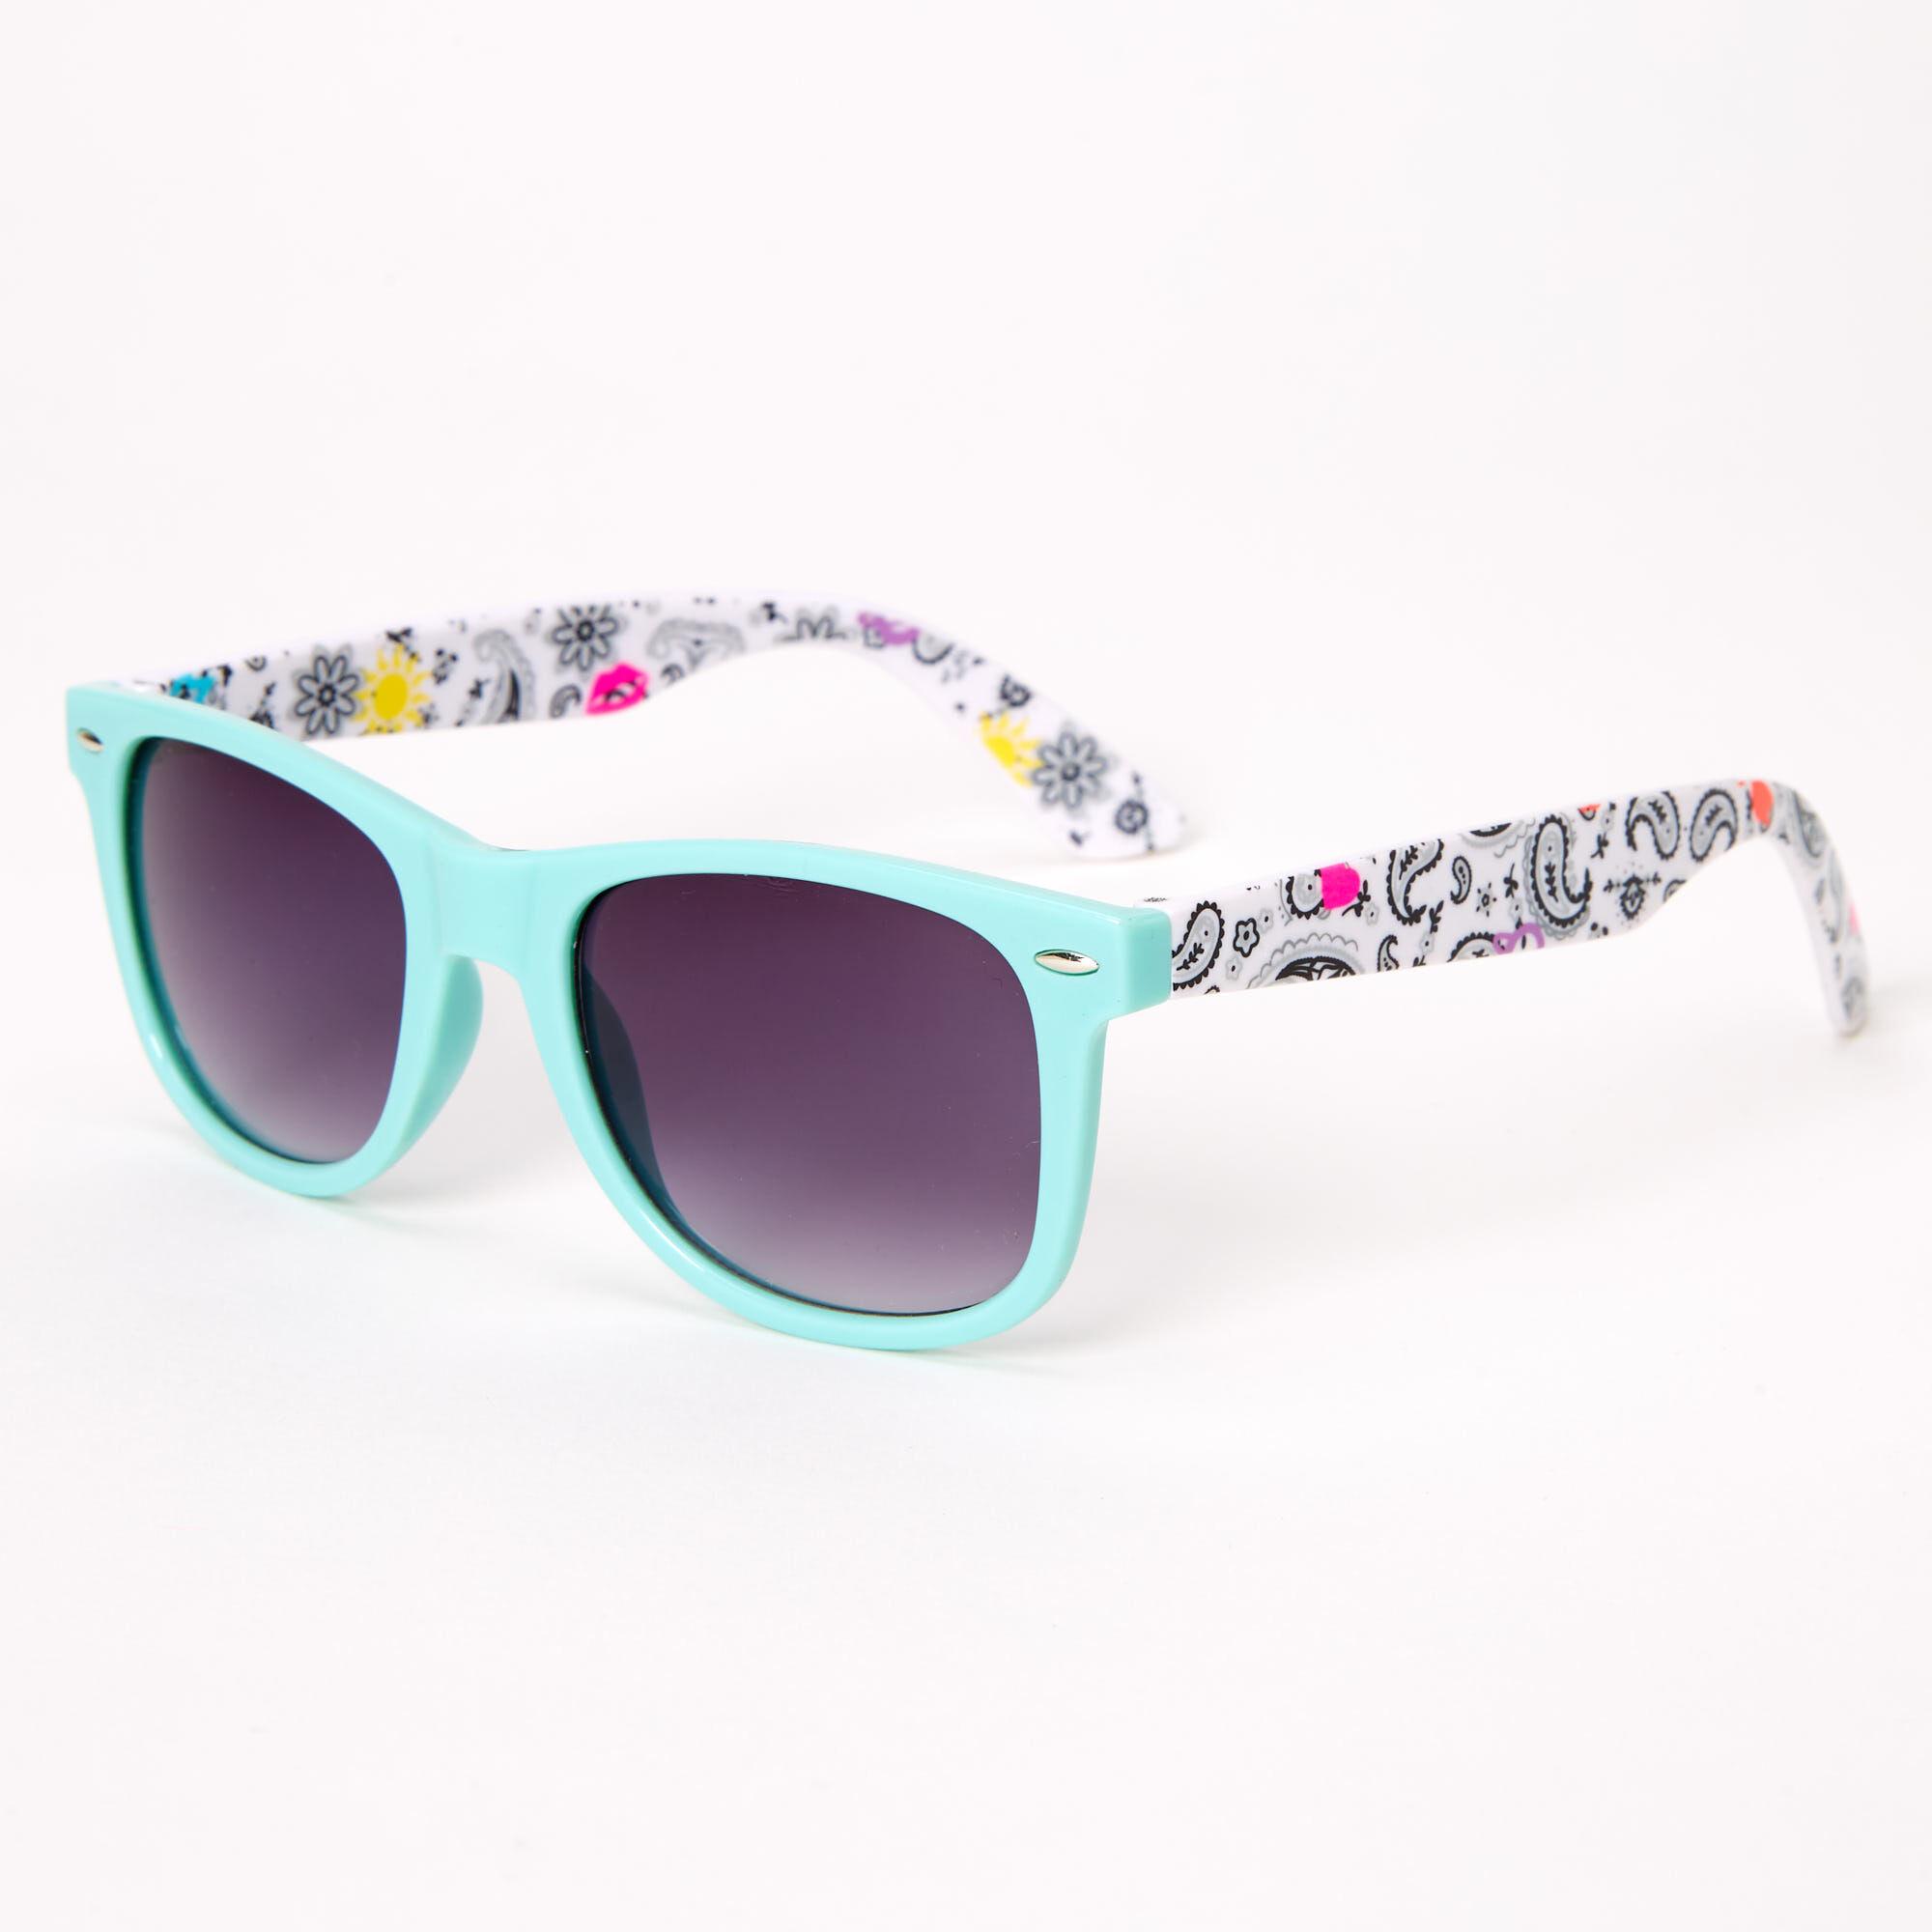 Claires Girls Chevron Retro Sunglasses Mint Green